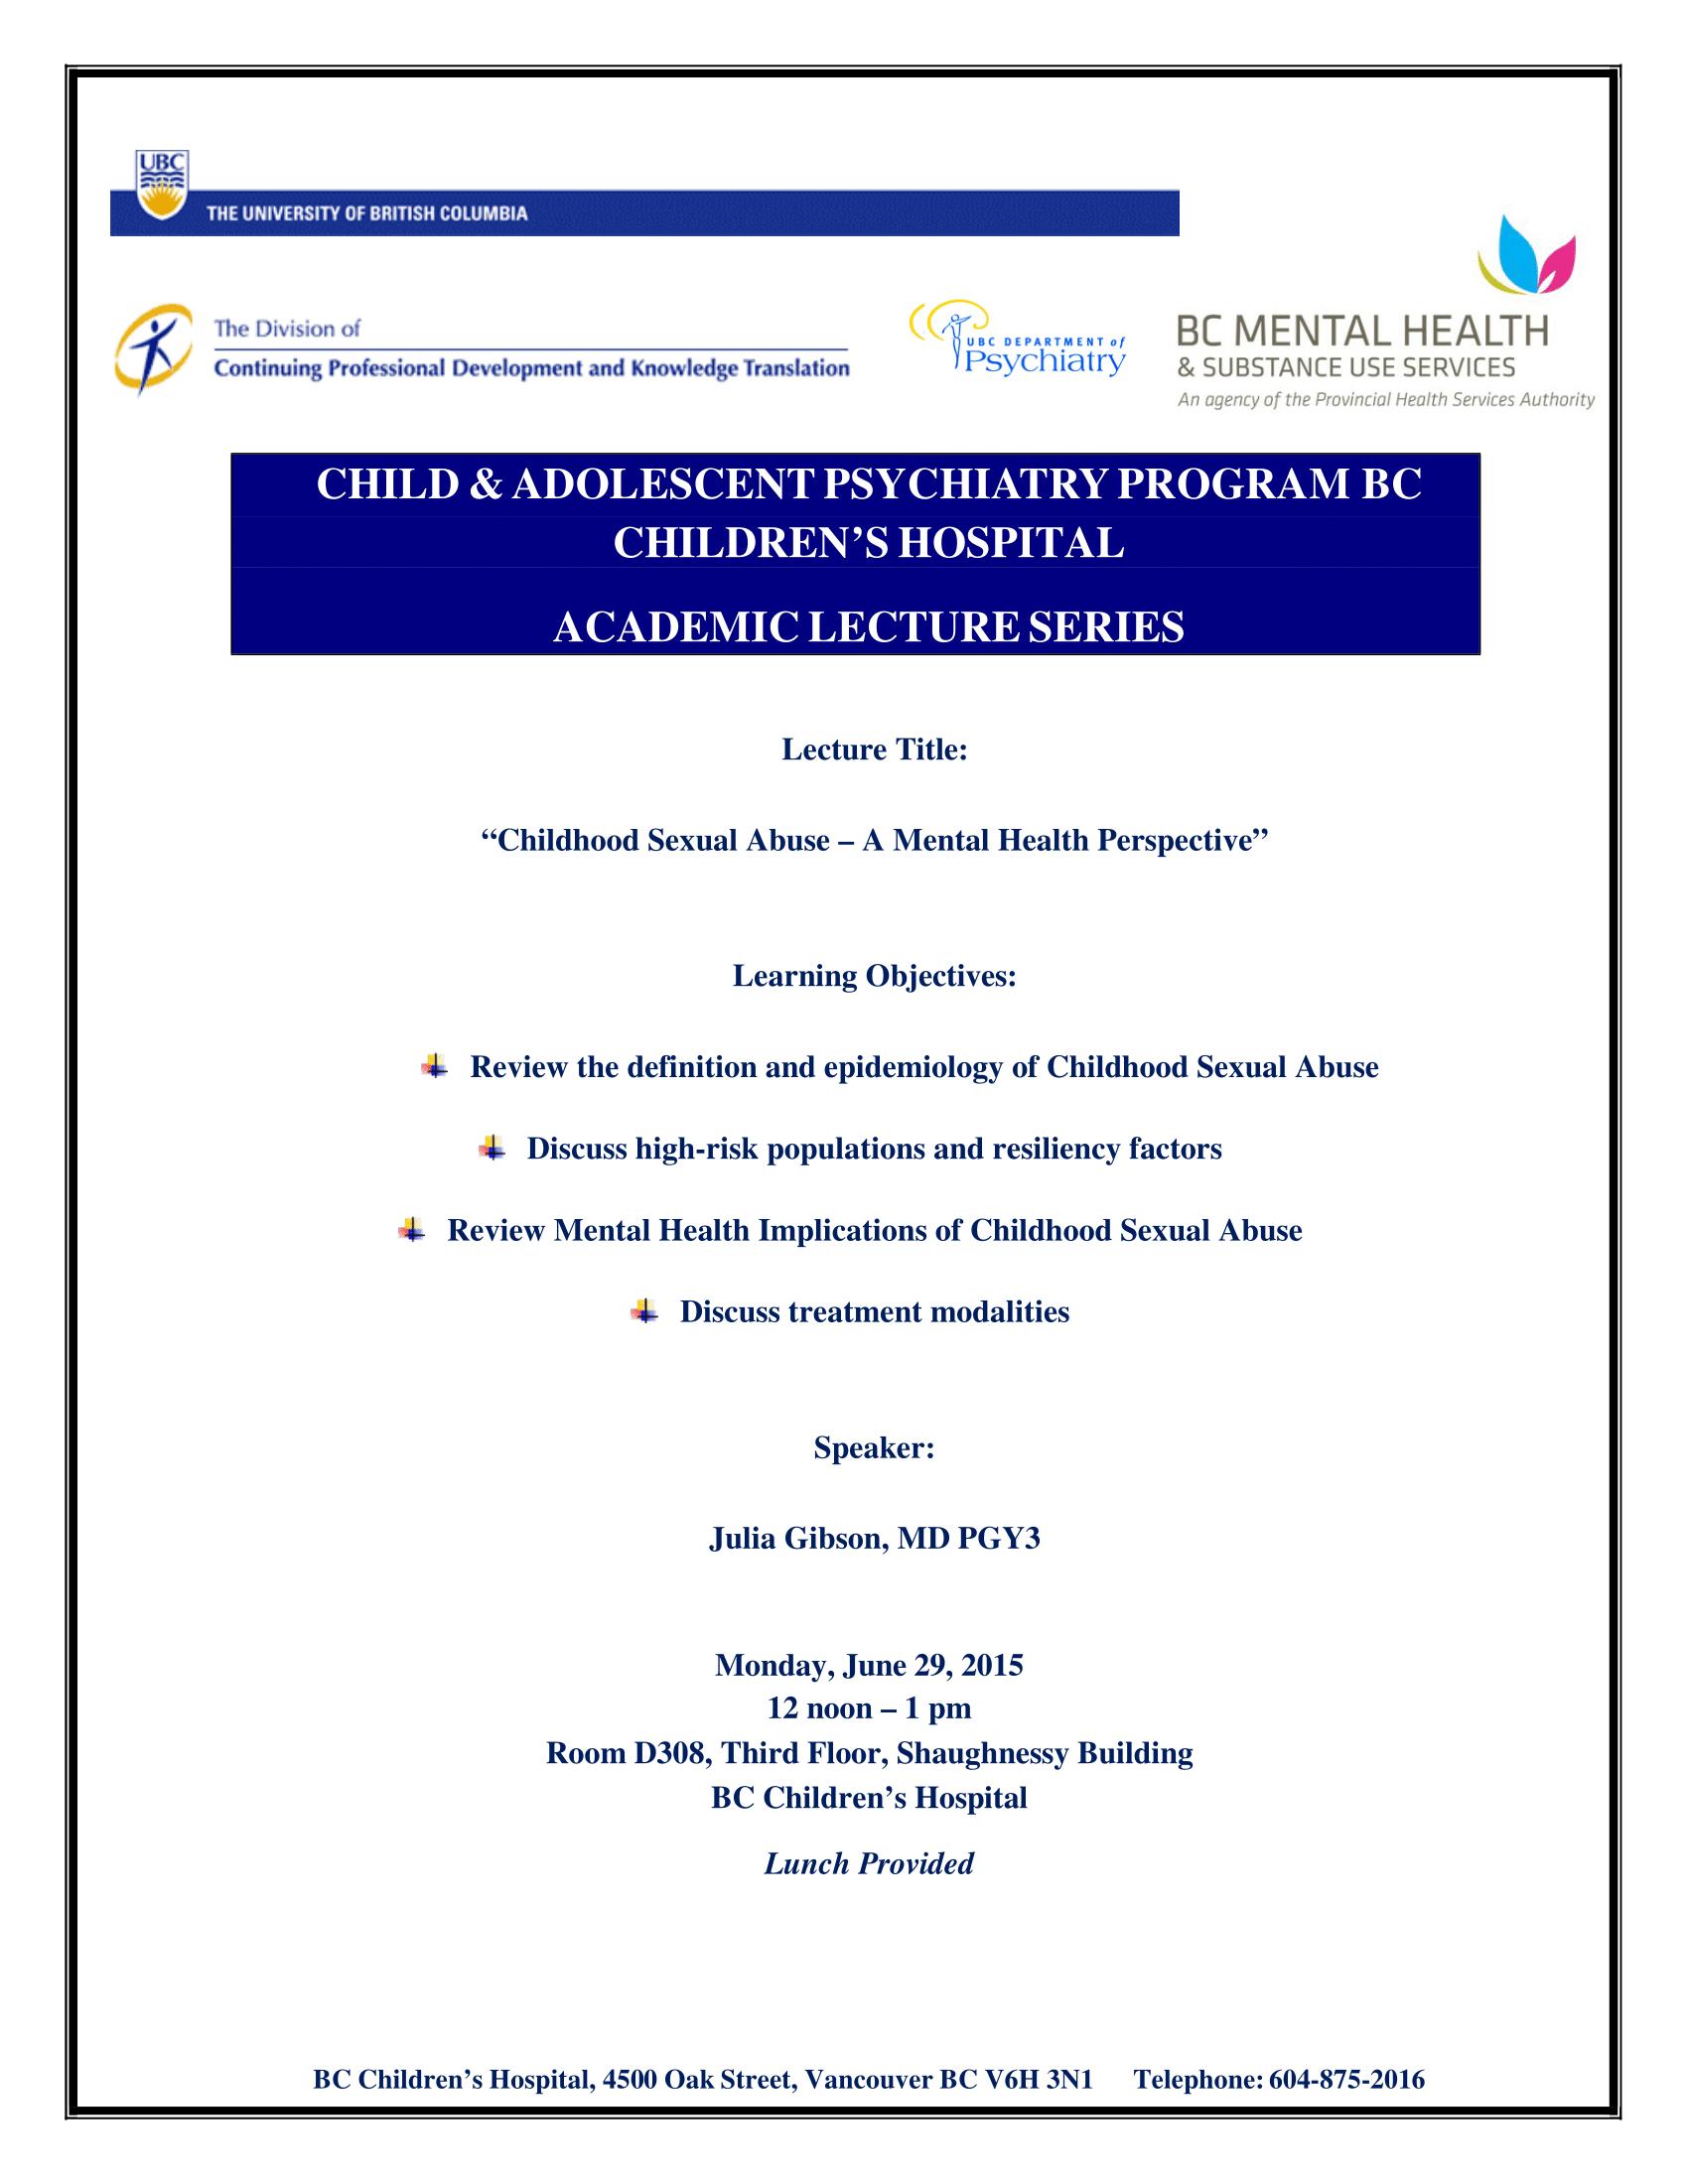 Academic Rounds June 29, 2015-1